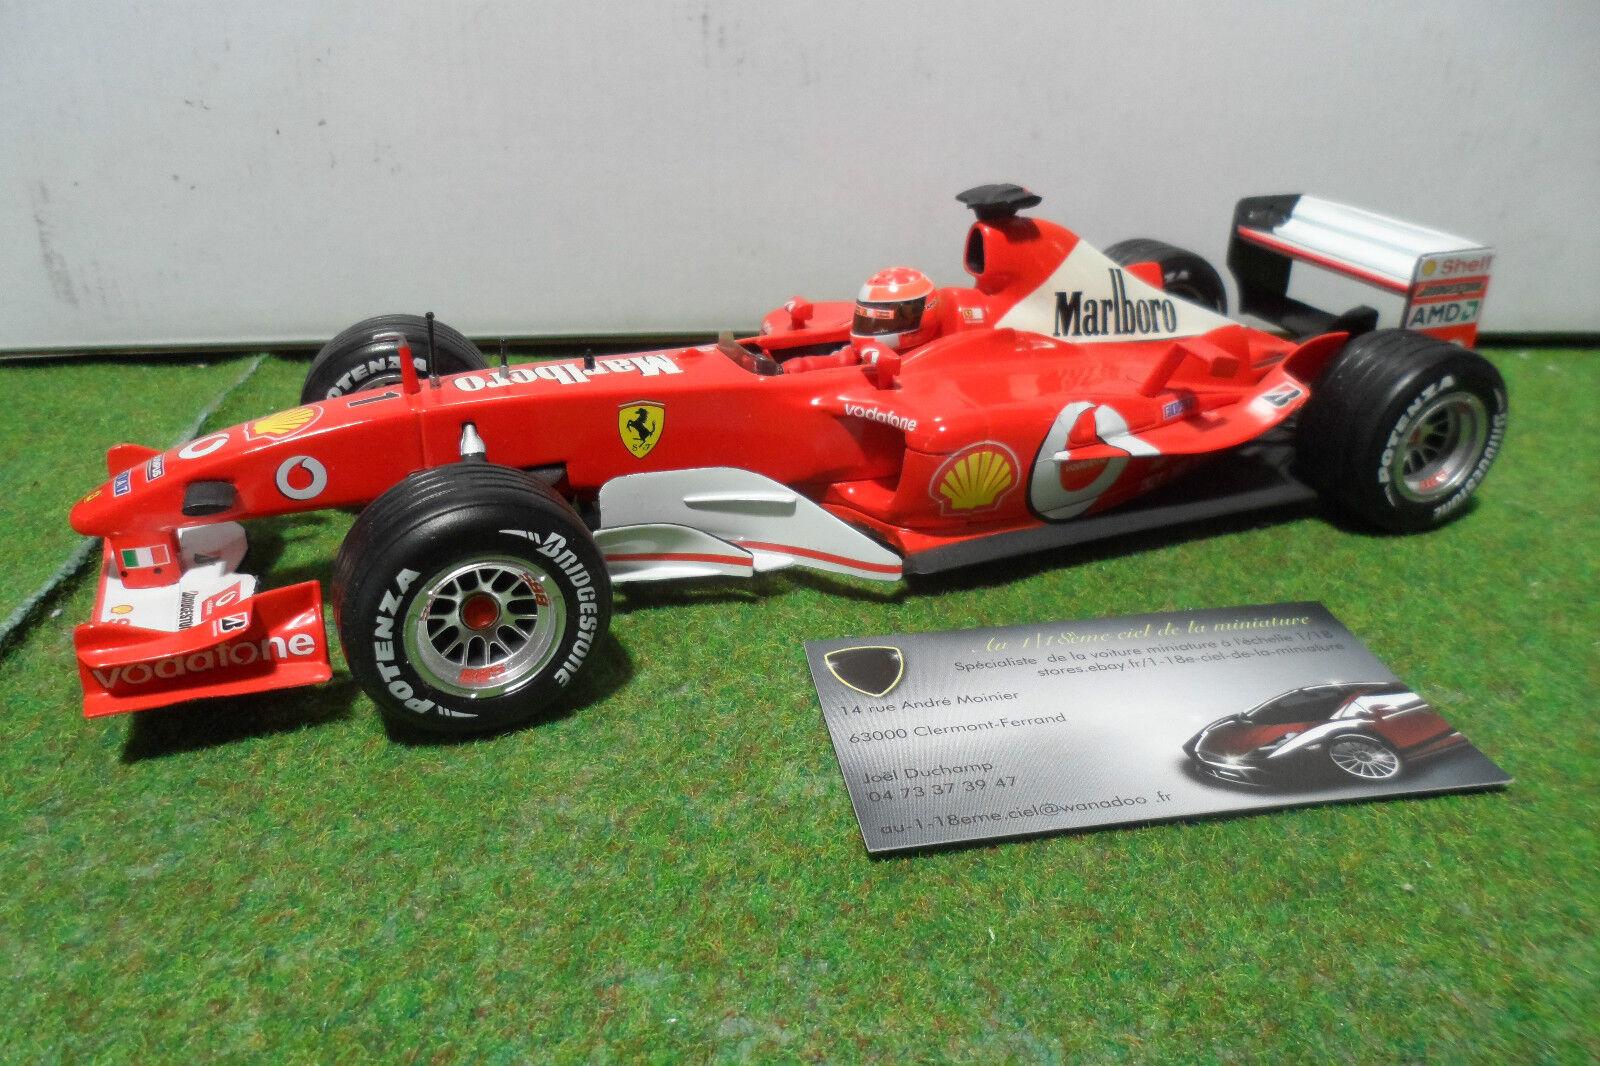 F1  FERRARI F2003 GA M. SCHUMACHER SPONSOR MARLBoro au 1 18 HOT WHEELS formule 1